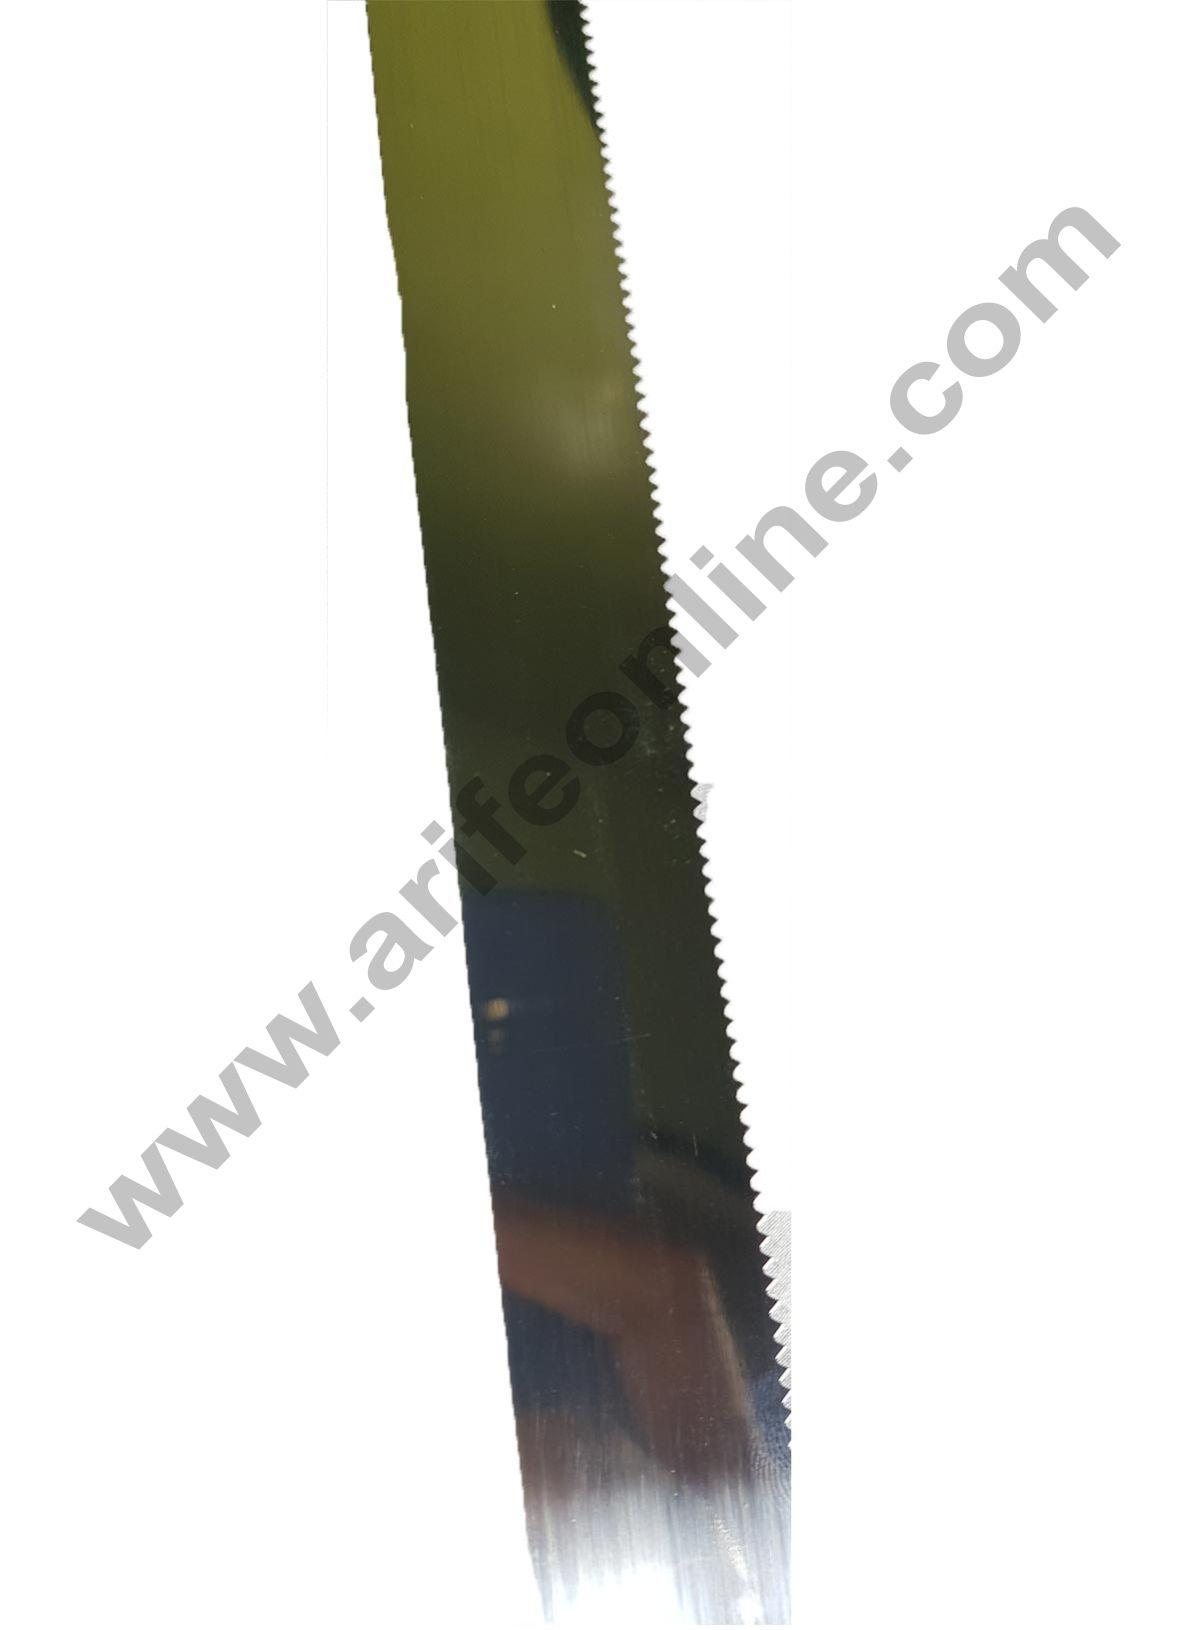 Cake Decor Straight Spatula Serrated Knife,Combo Cake Pallete Knife-12inch/1pieces